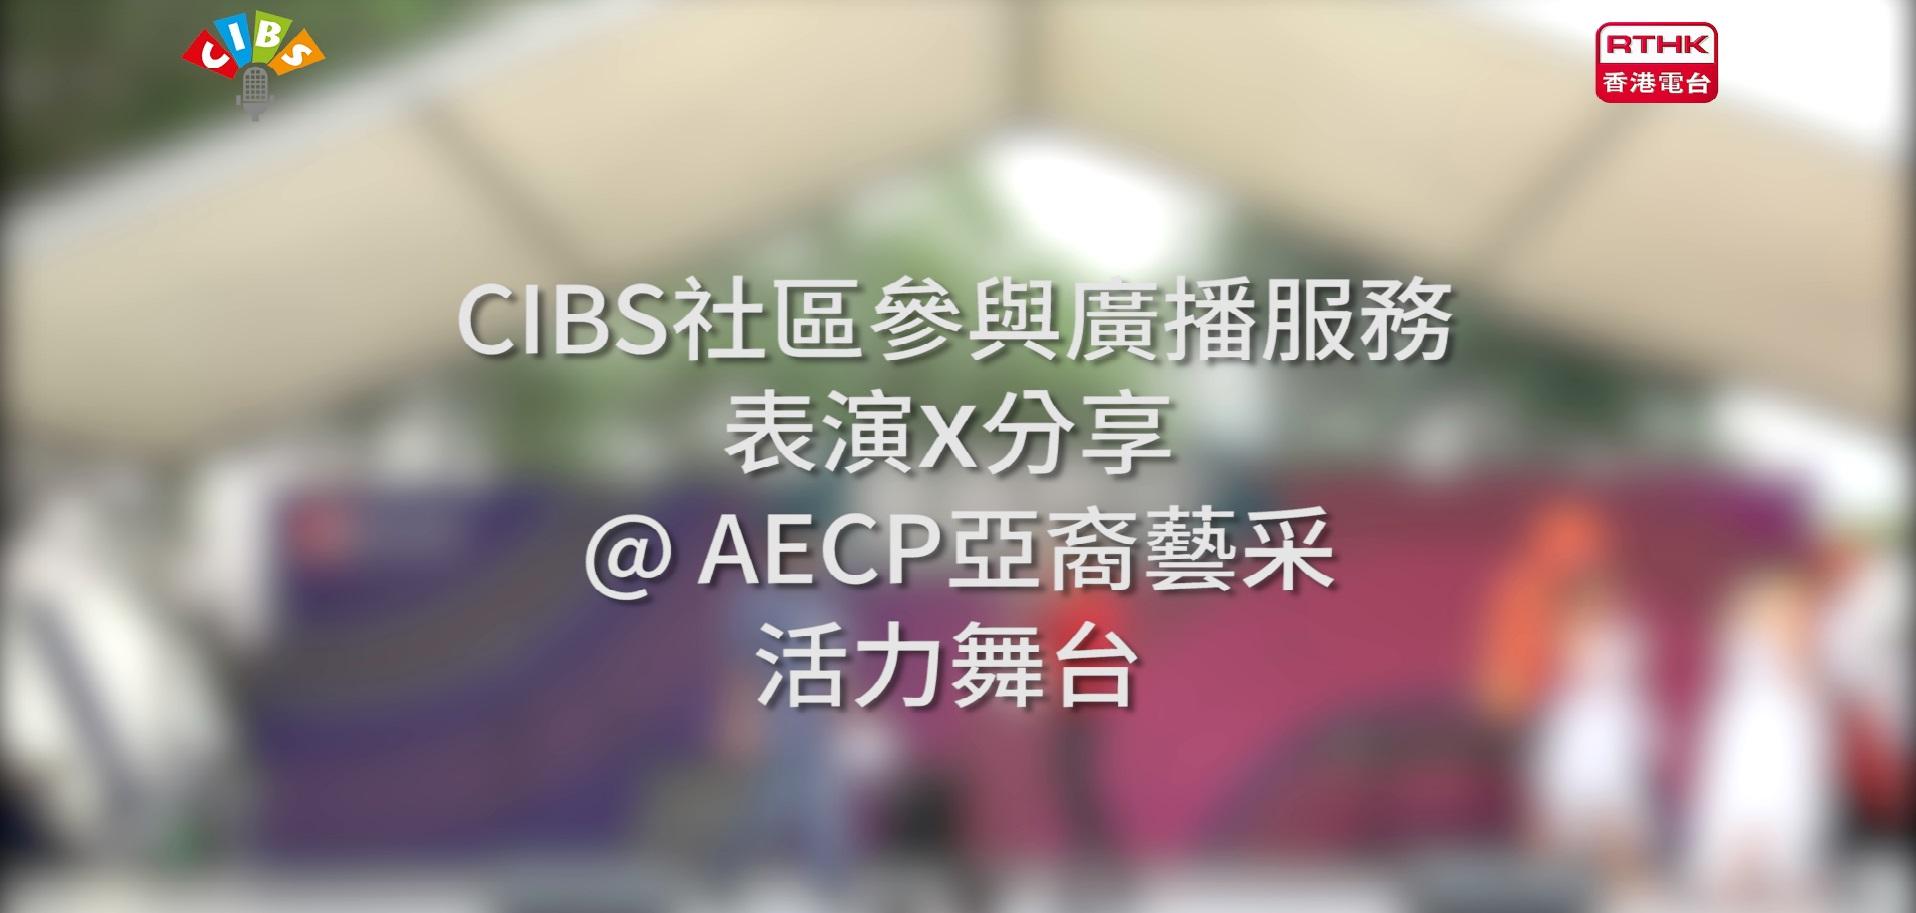 CIBS 表演x分享 @ 亚裔艺采2017 (活力舞台)